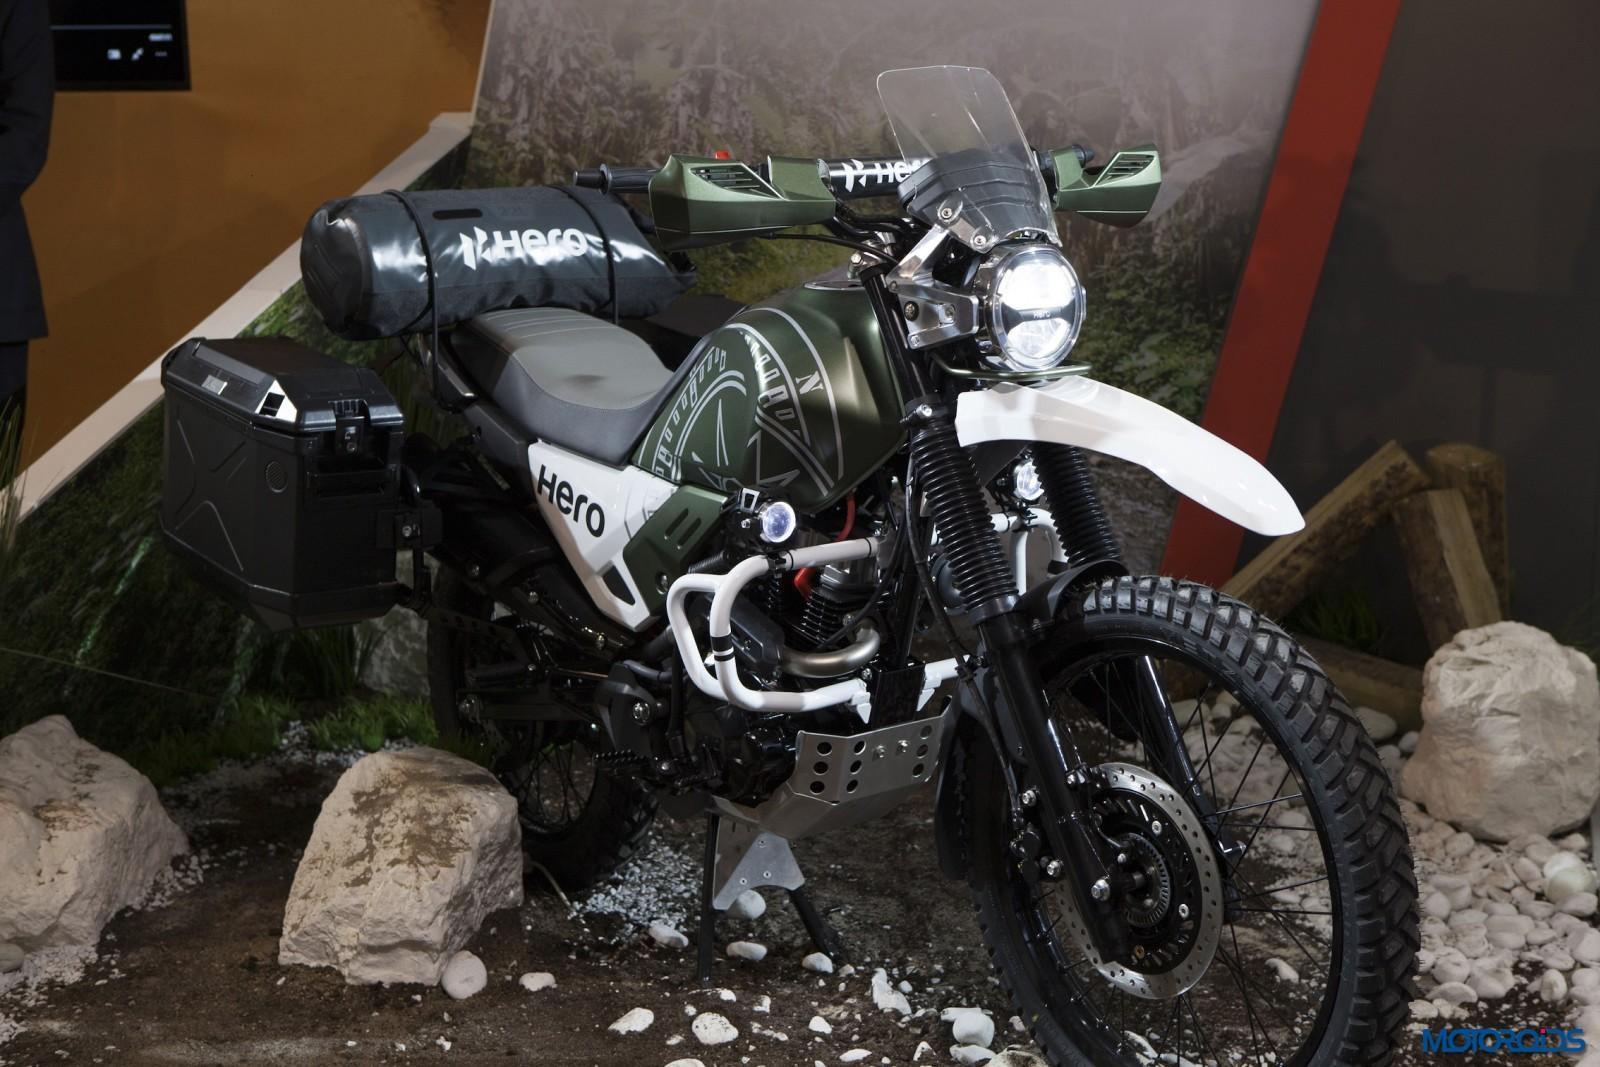 Image result for hero motocorp xpulse